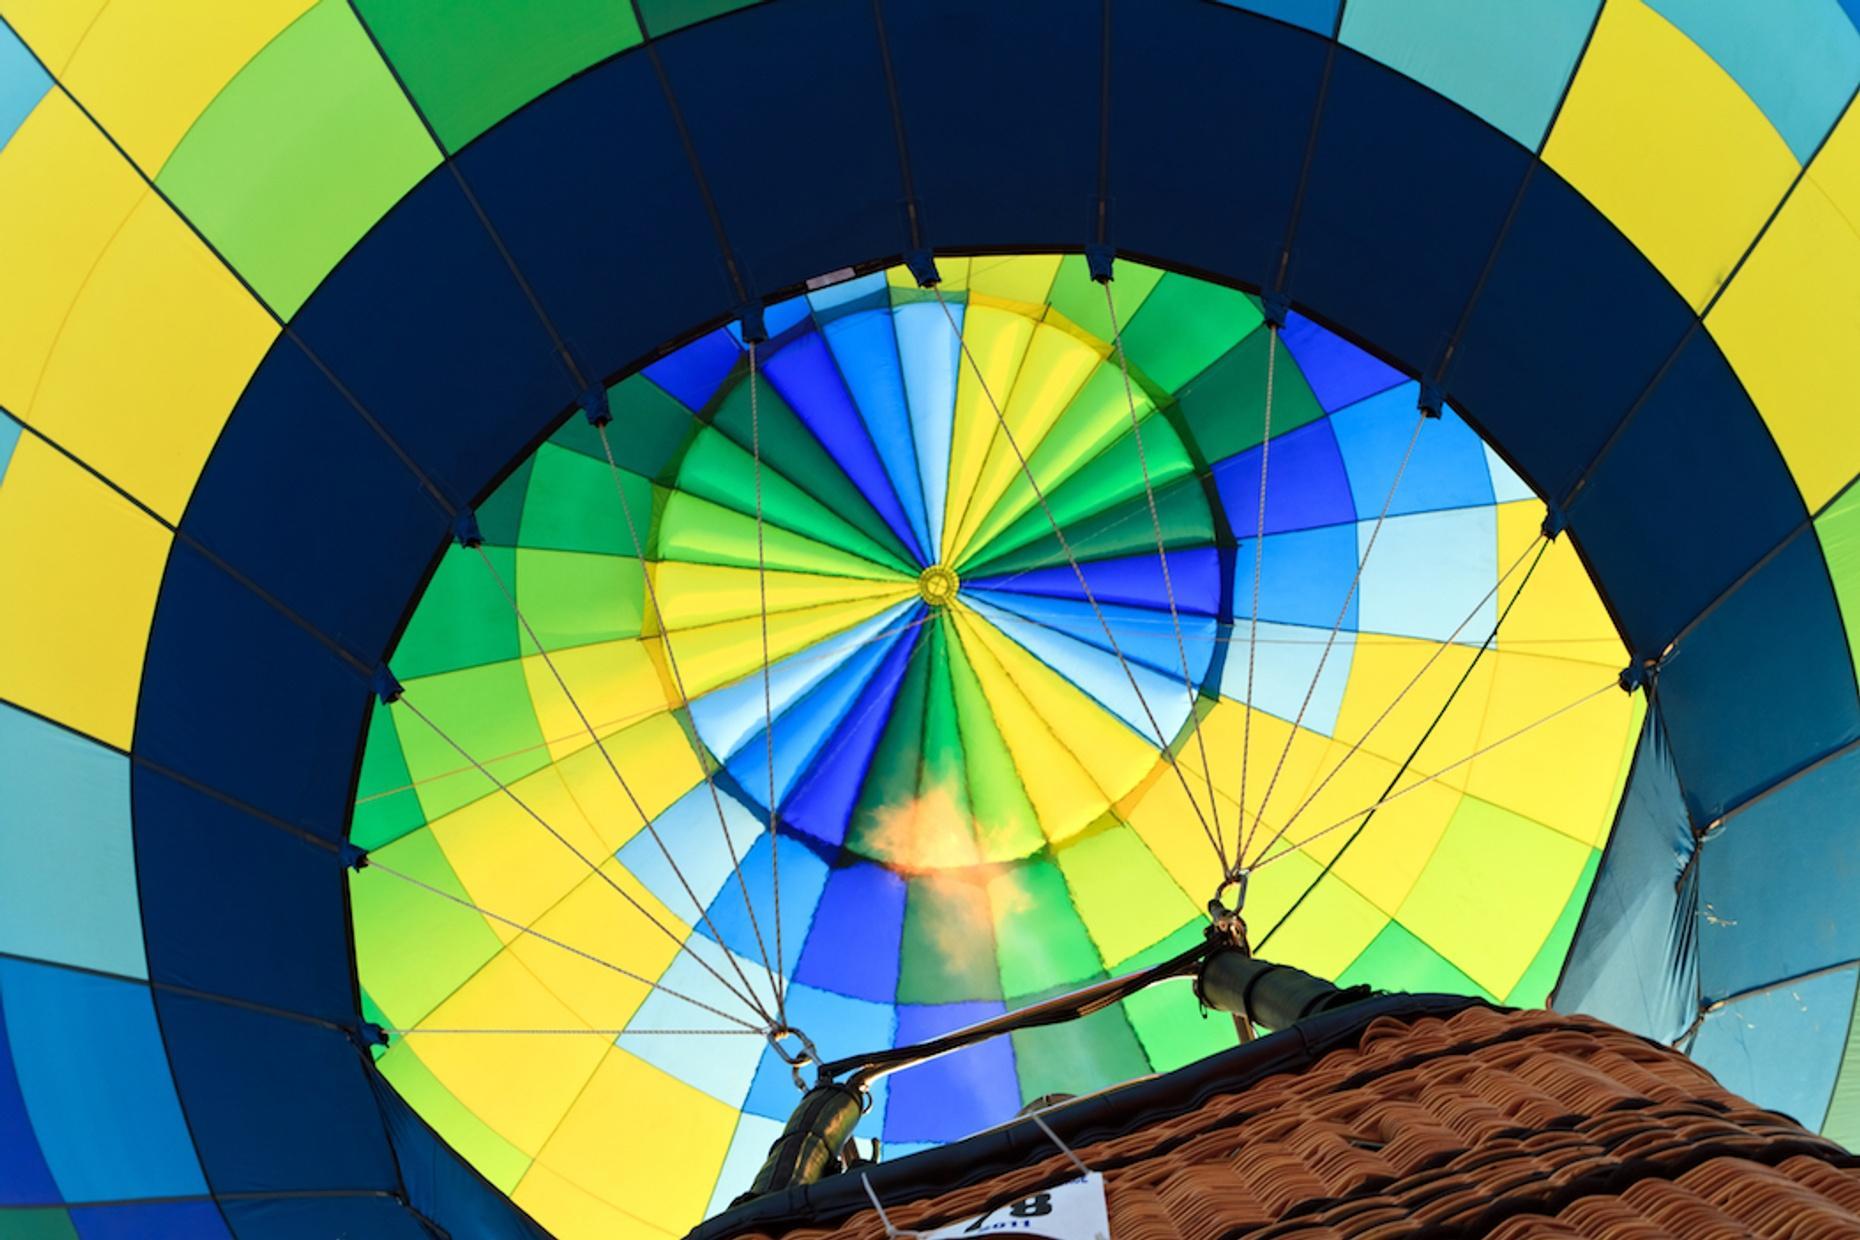 Hot Air Balloon Flight in Napa